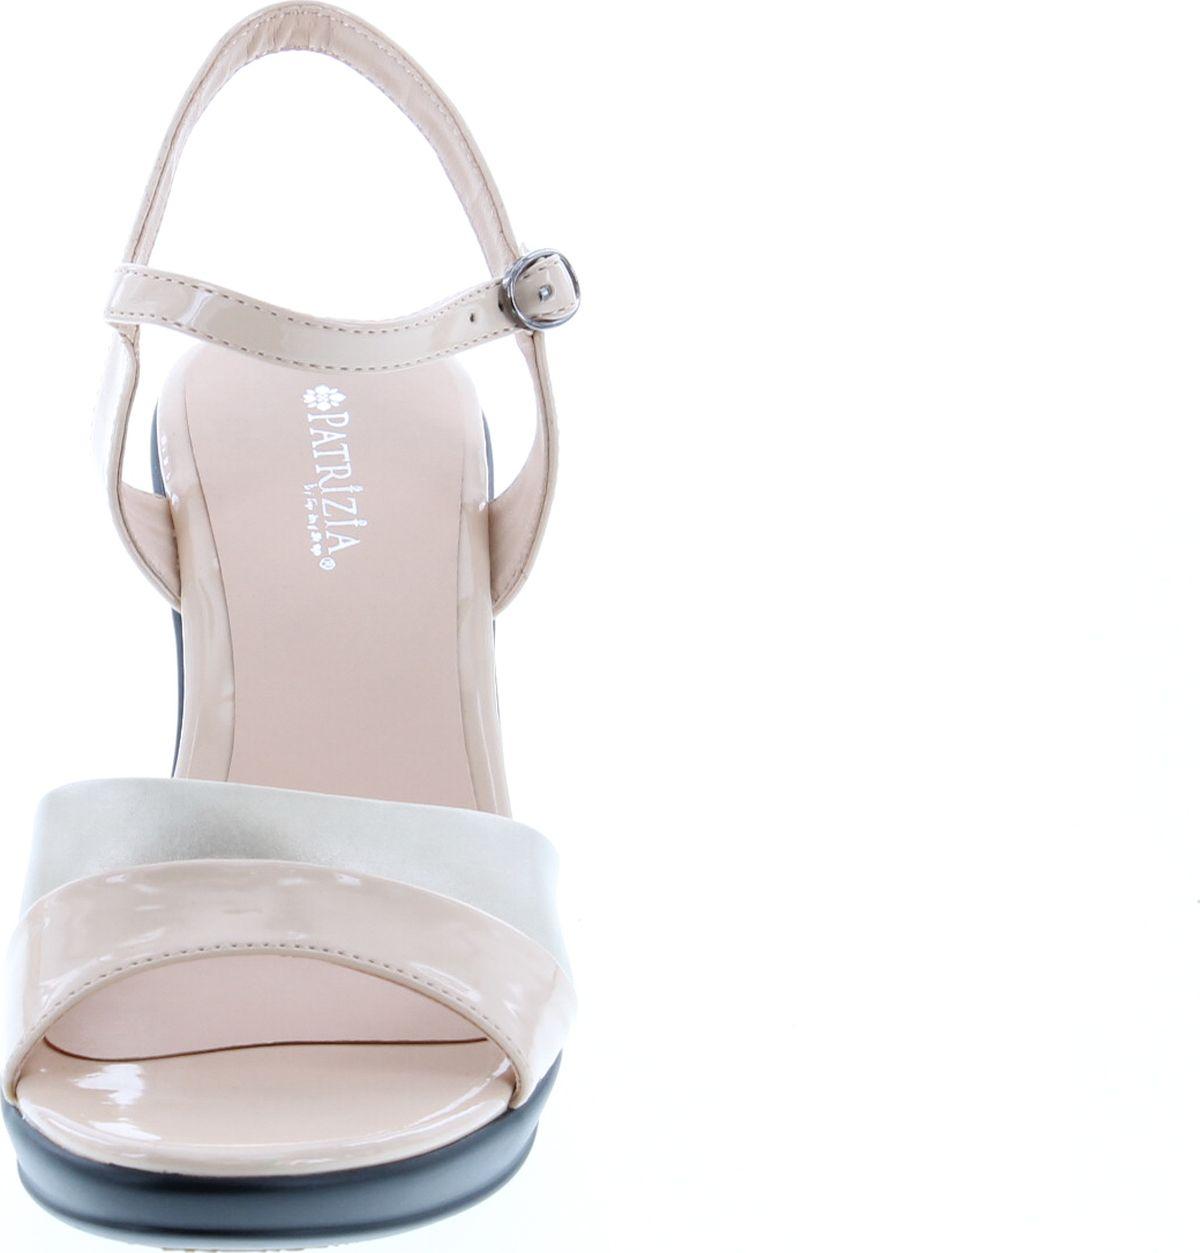 thumbnail 12 - PATRIZIA Womens Piera Fashion Sandals